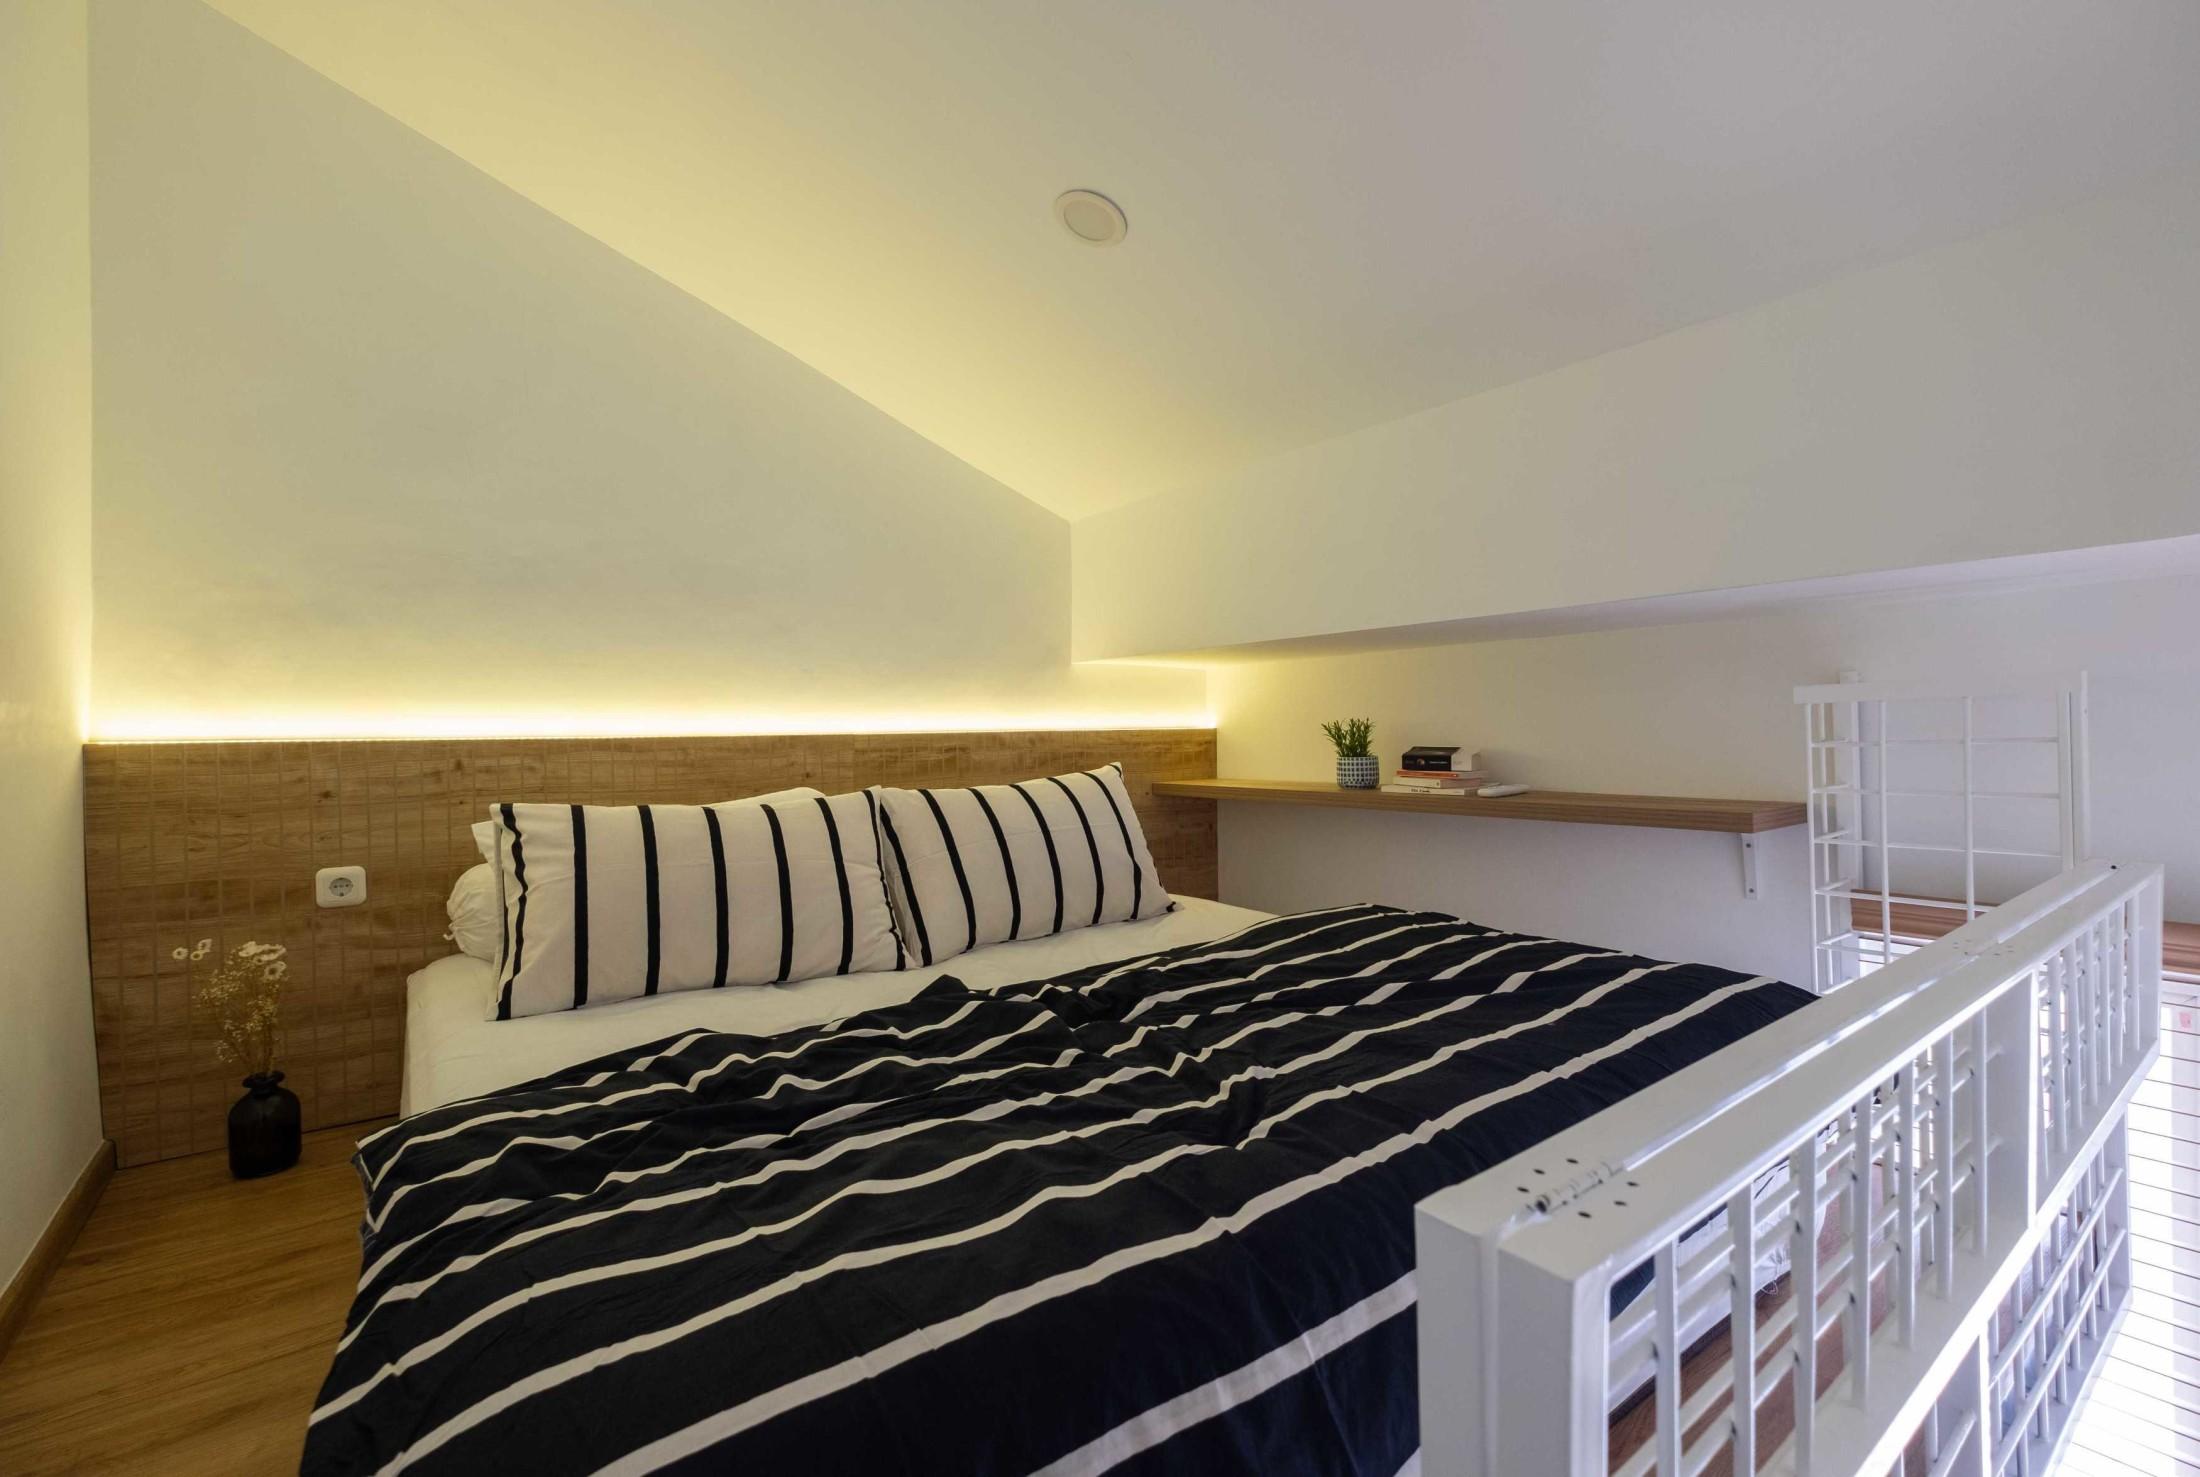 Kecerdikan memanfaatkan area tepat di bawah atap menjadikan rumah yang selesai tahun 2018 ini, memiliki kamar loft yang nyaman. Tidak hanya satu, melainkan dua kamar loft.